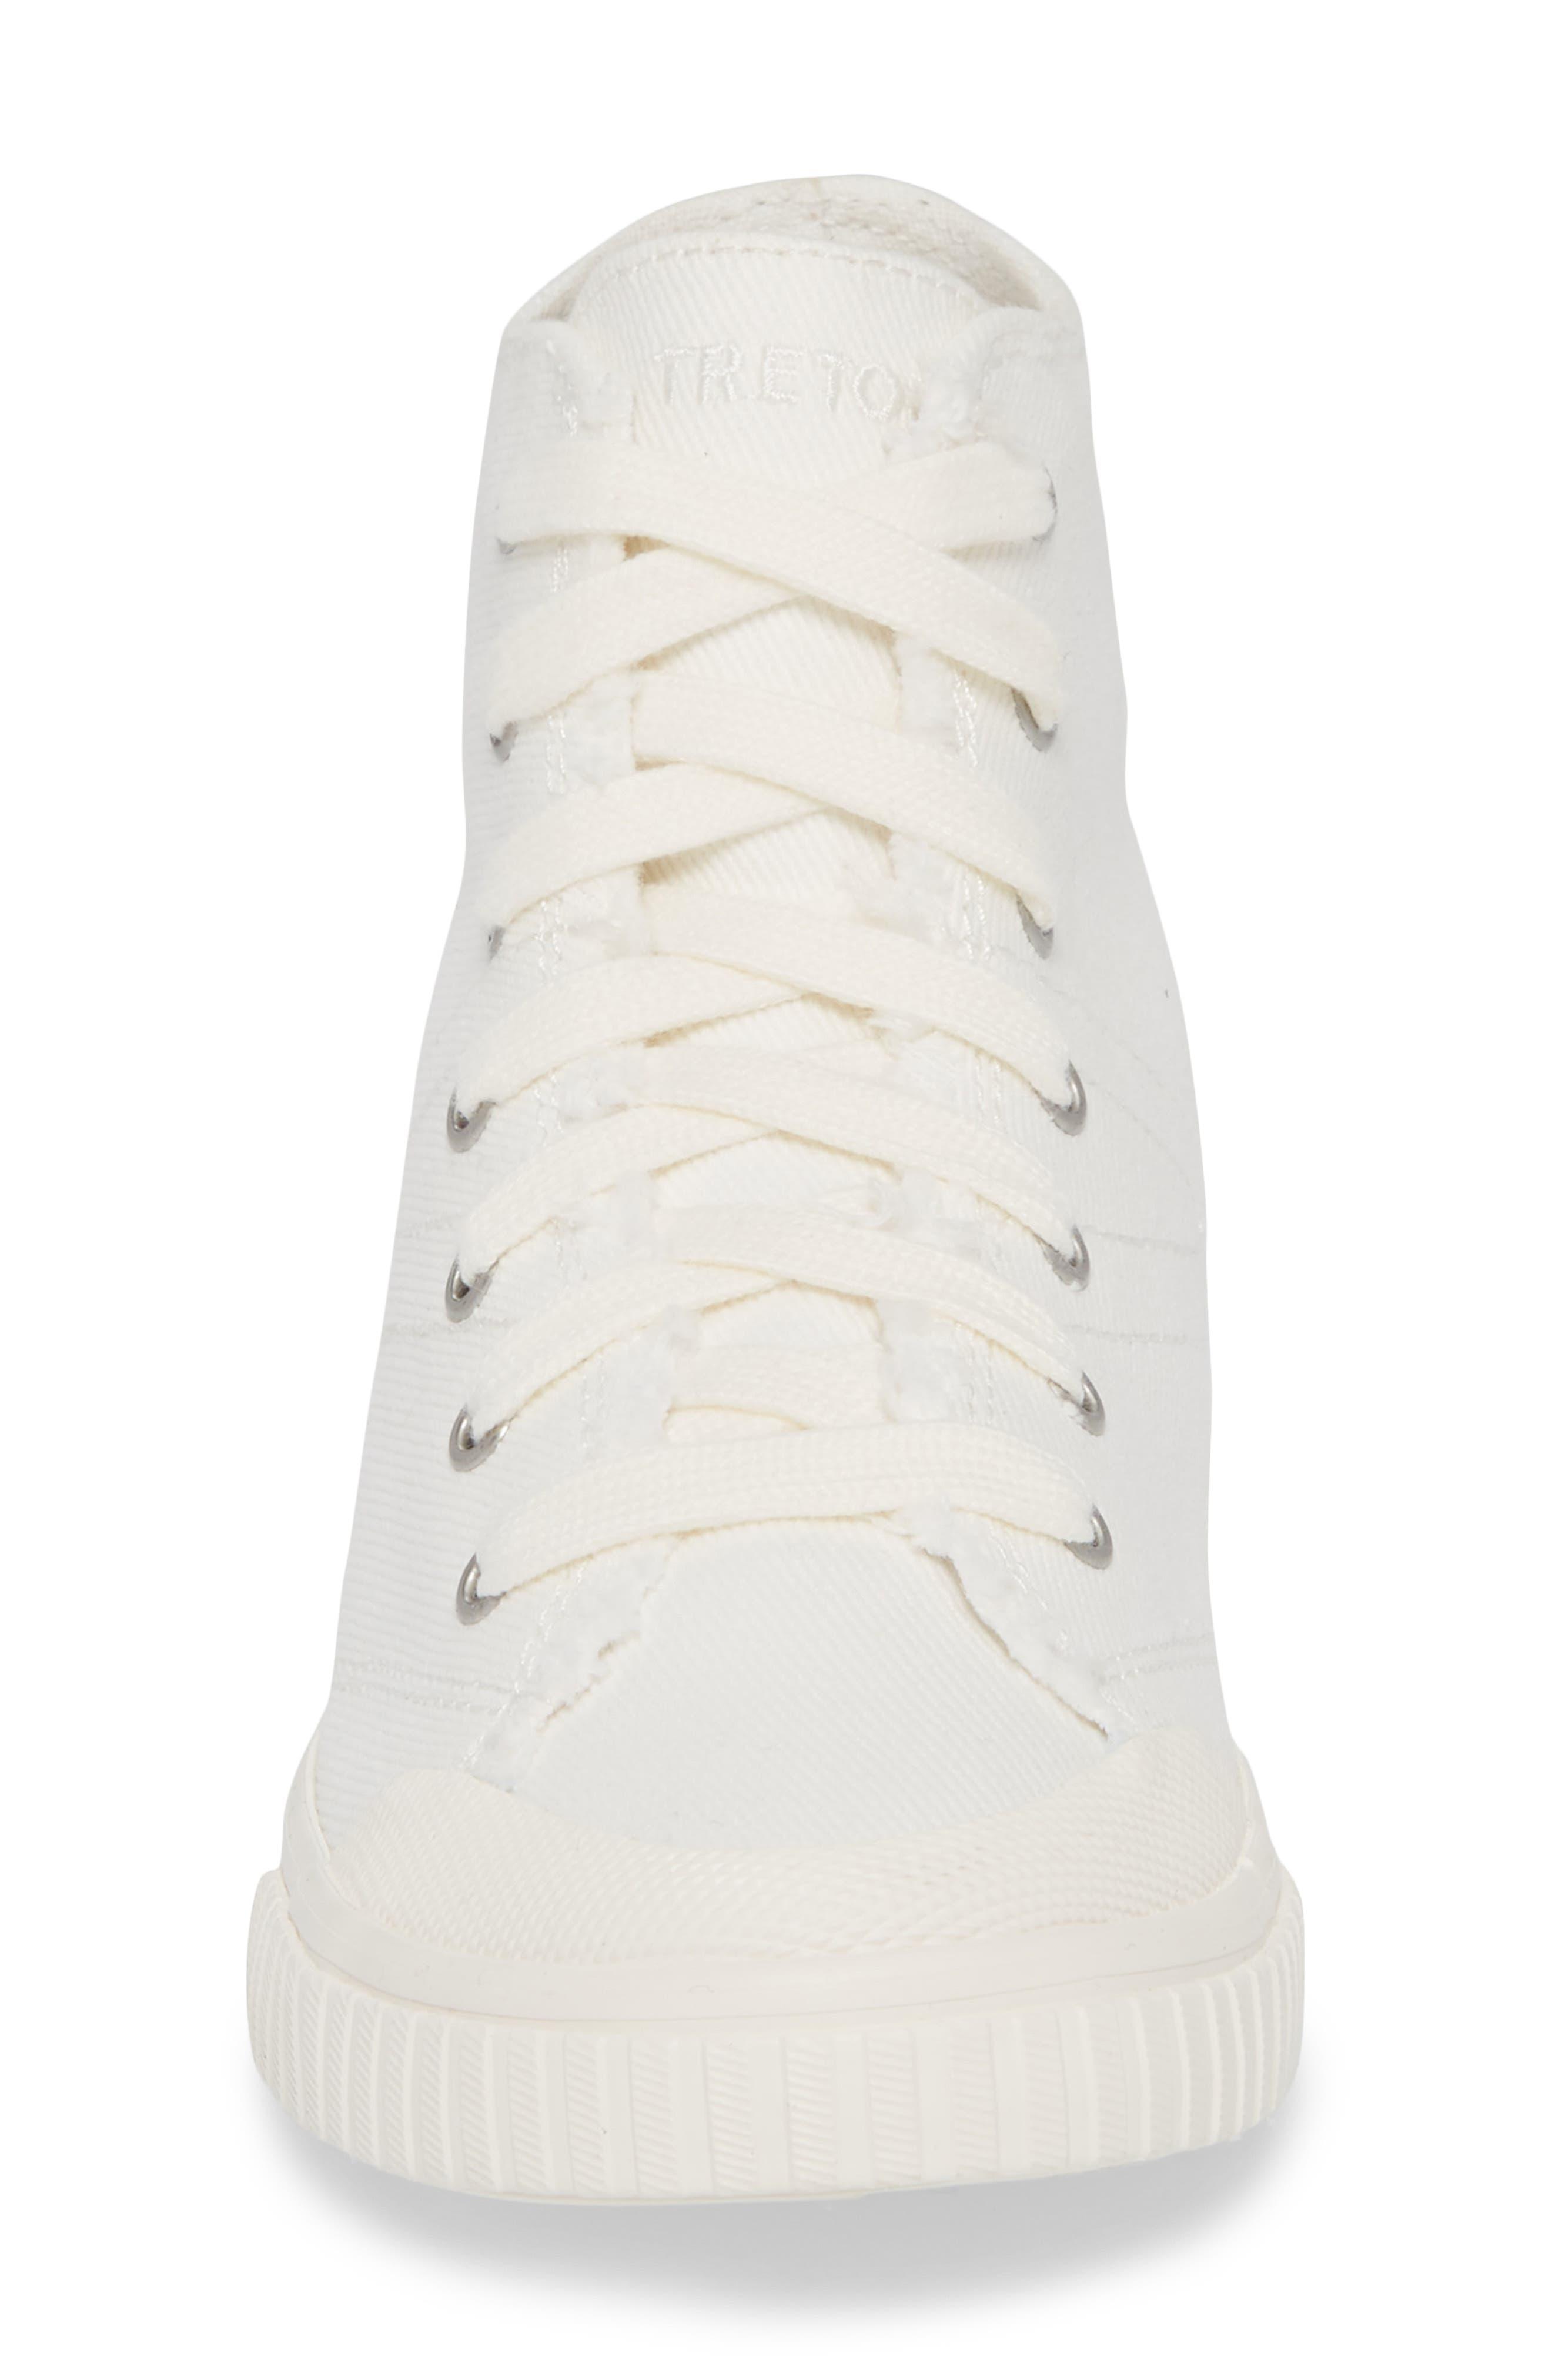 Marley 2 High Top Sneaker,                             Alternate thumbnail 4, color,                             150